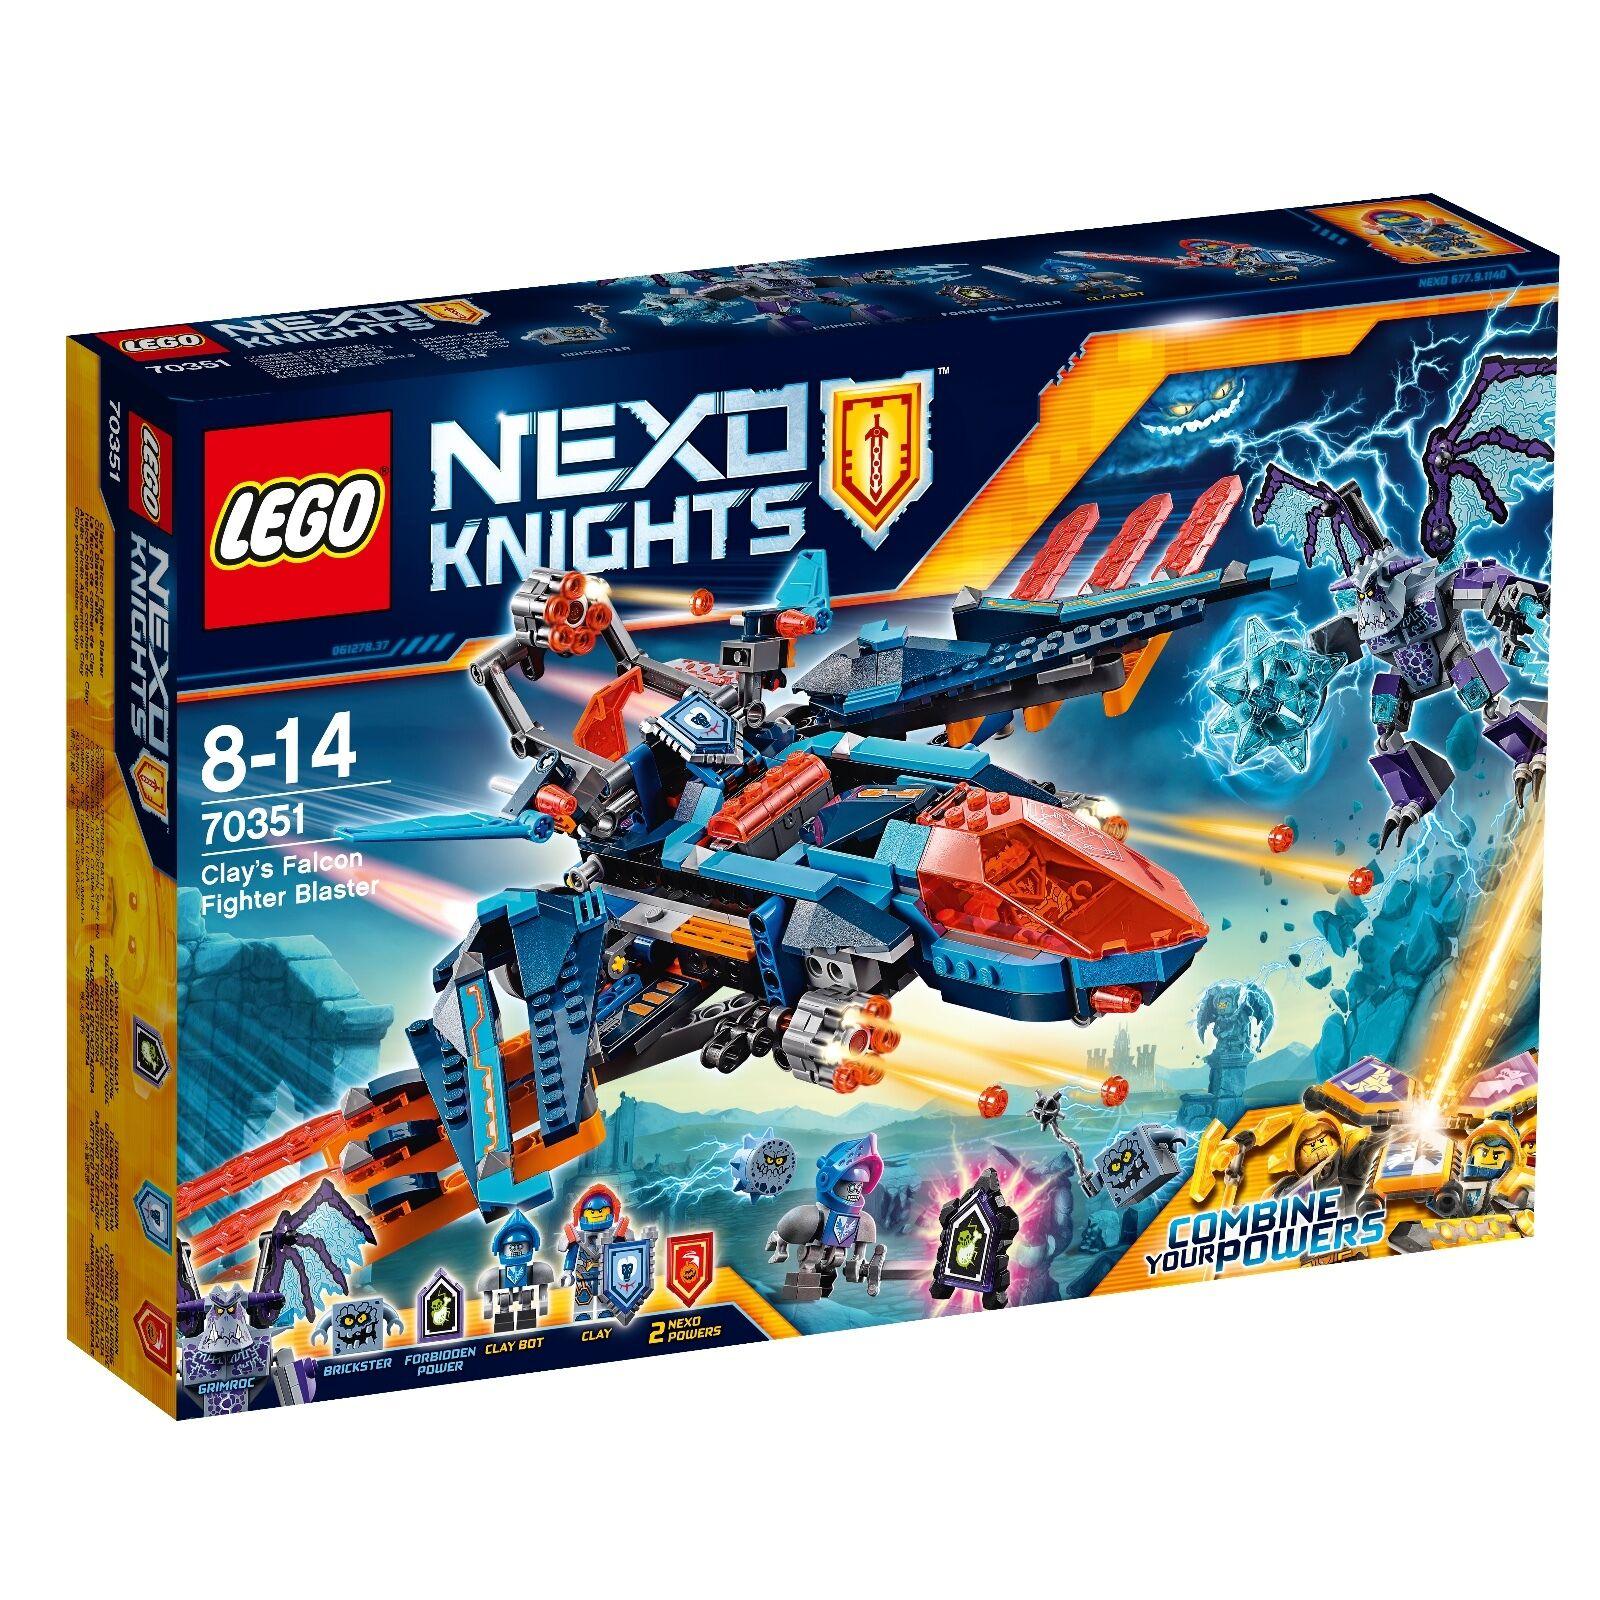 LEGO® Nexo Knights™ 70351 Clays Blaster-Falke NEU OVP NEW MISB NRFB